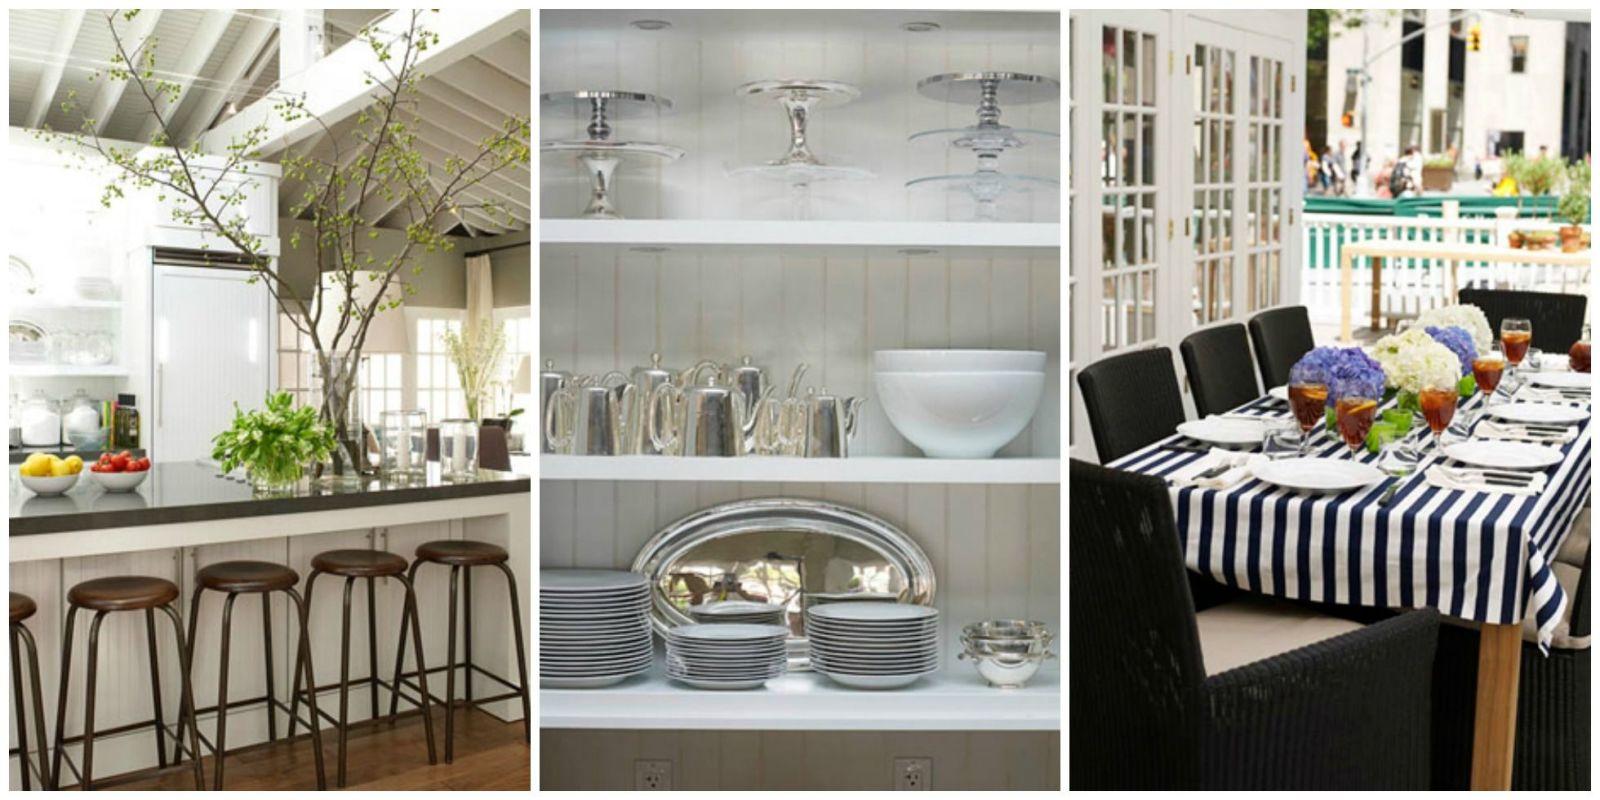 Country Kitchen Ideas From Ina Garten